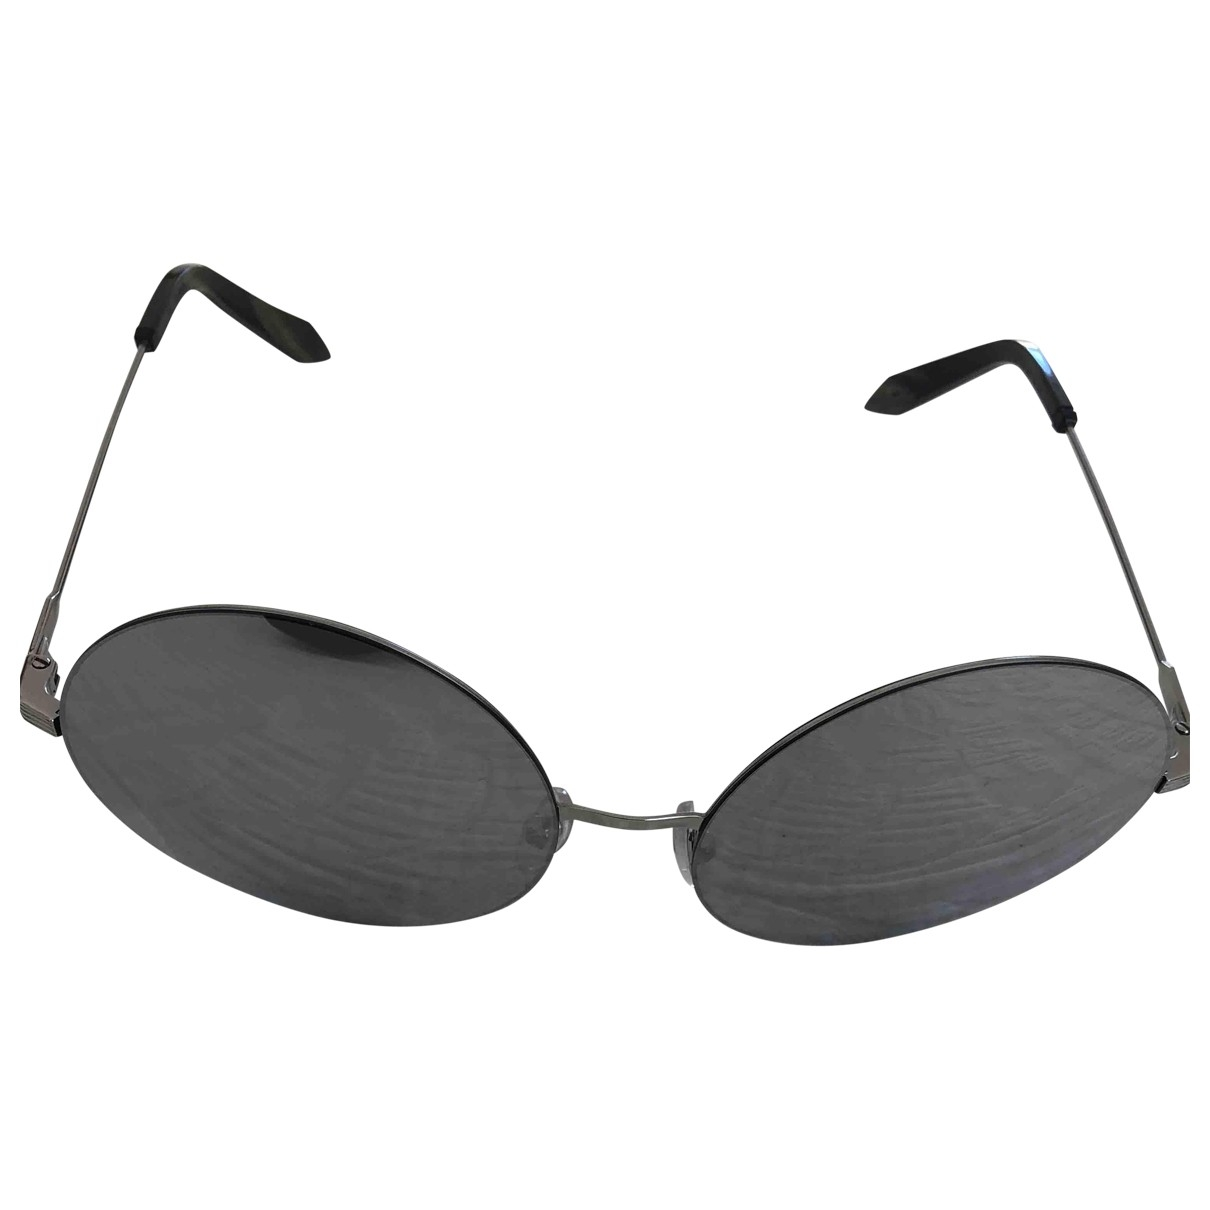 Victoria Beckham \N Silver Metal Sunglasses for Women \N